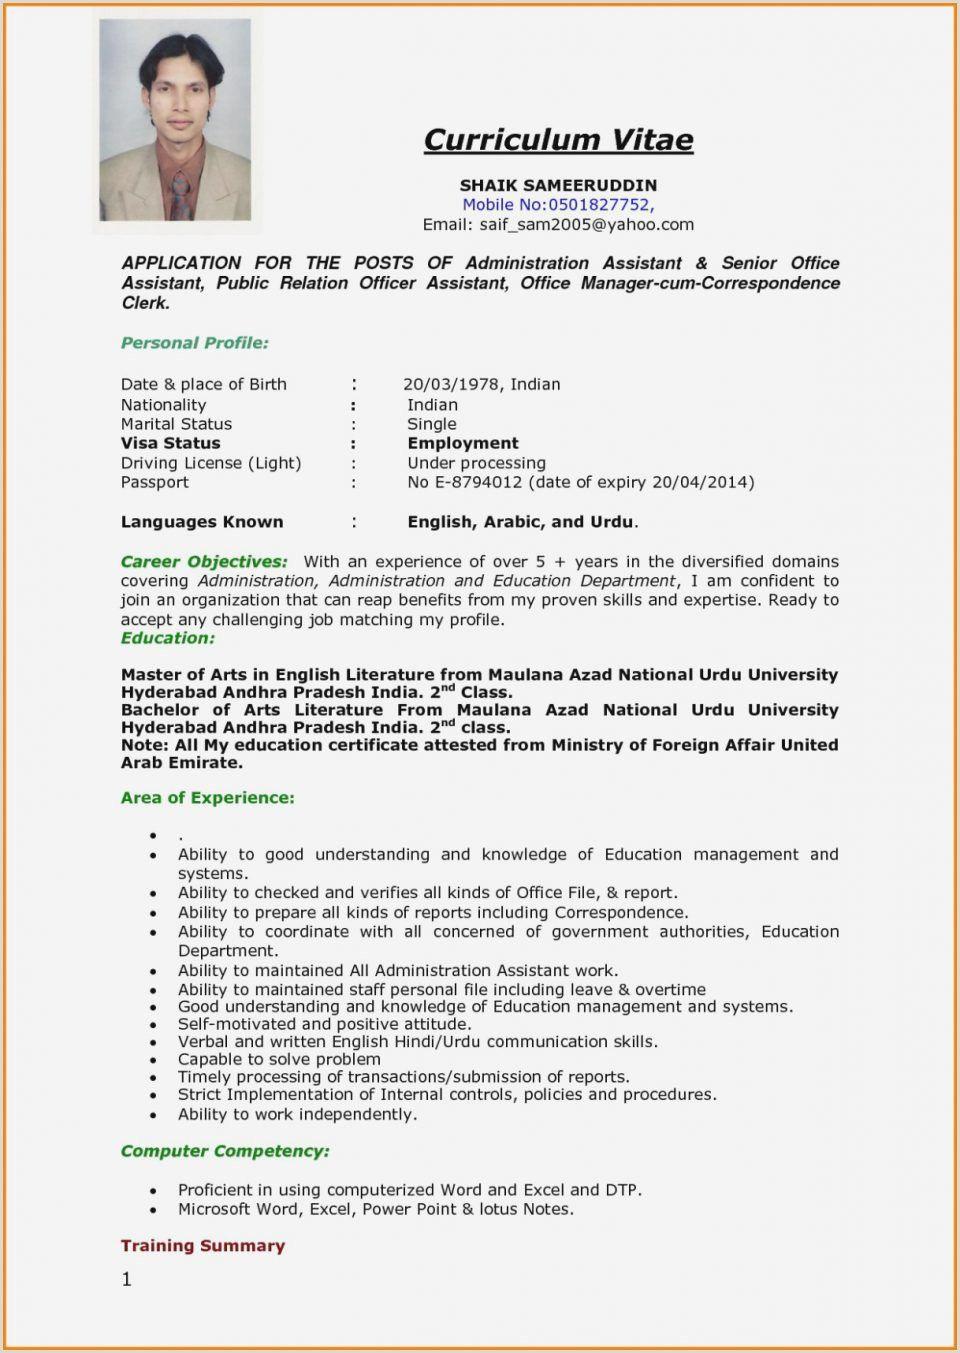 Curriculum Vitae Format Pdf Cv Format Job Interview Proper Resume